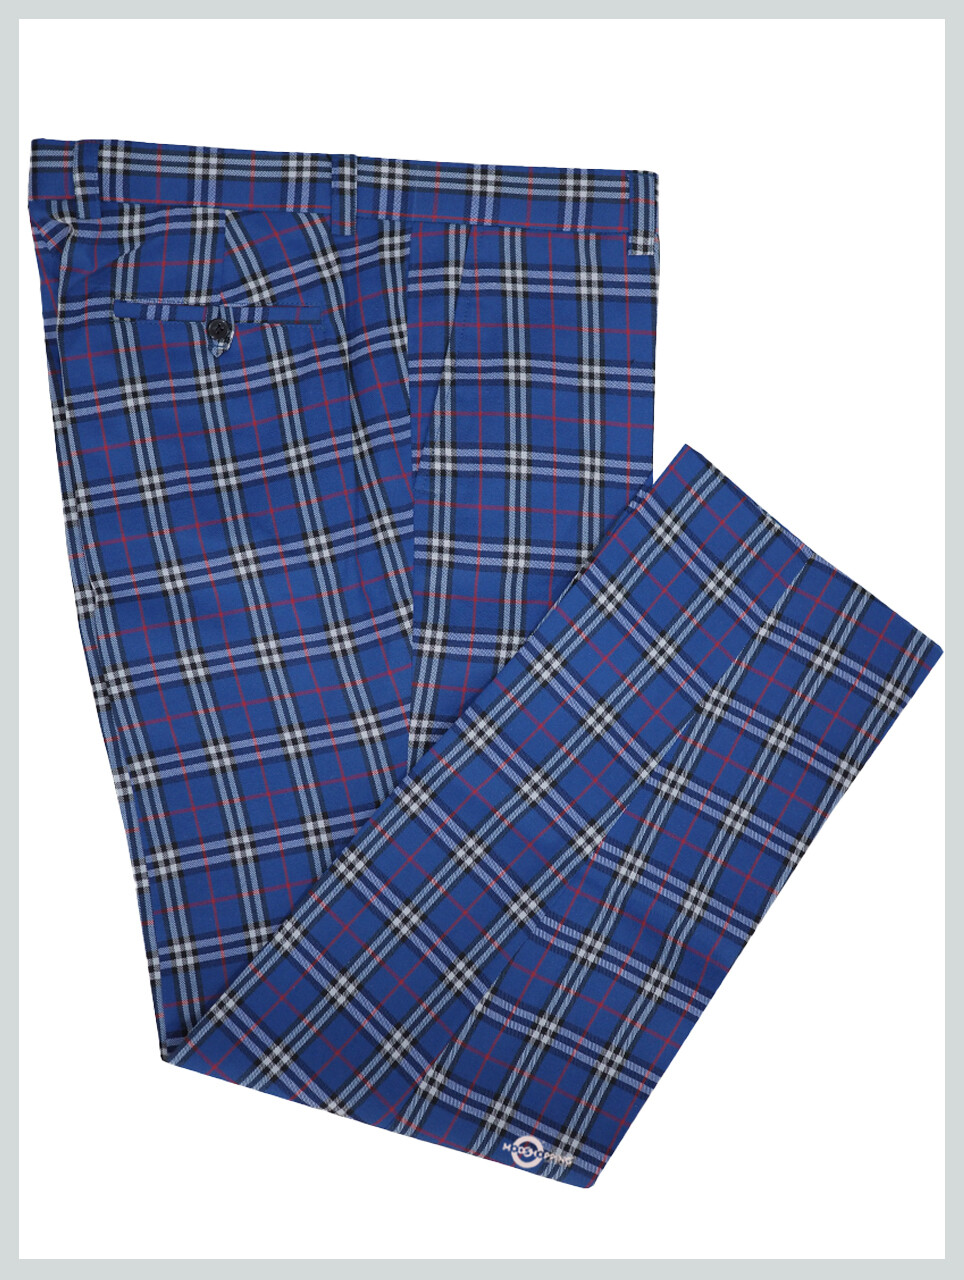 Check Trouser  60s Madras Check Blue Trouser For Mens